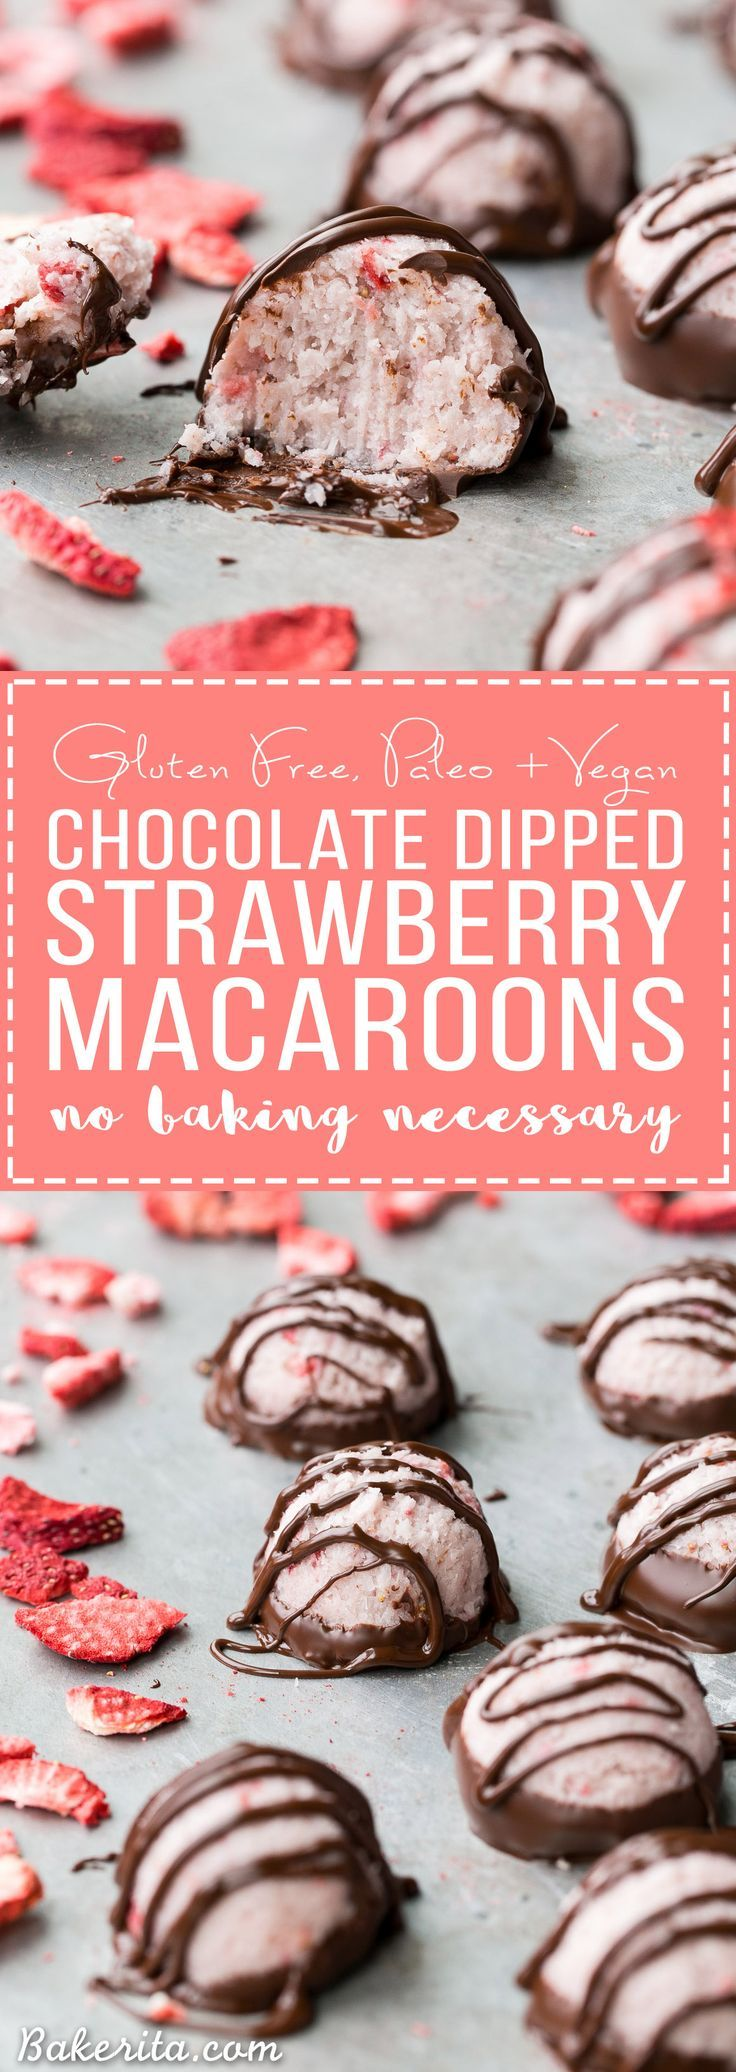 No Bake Chocolate Dipped Strawberry Macaroons Gluten Free Paleo